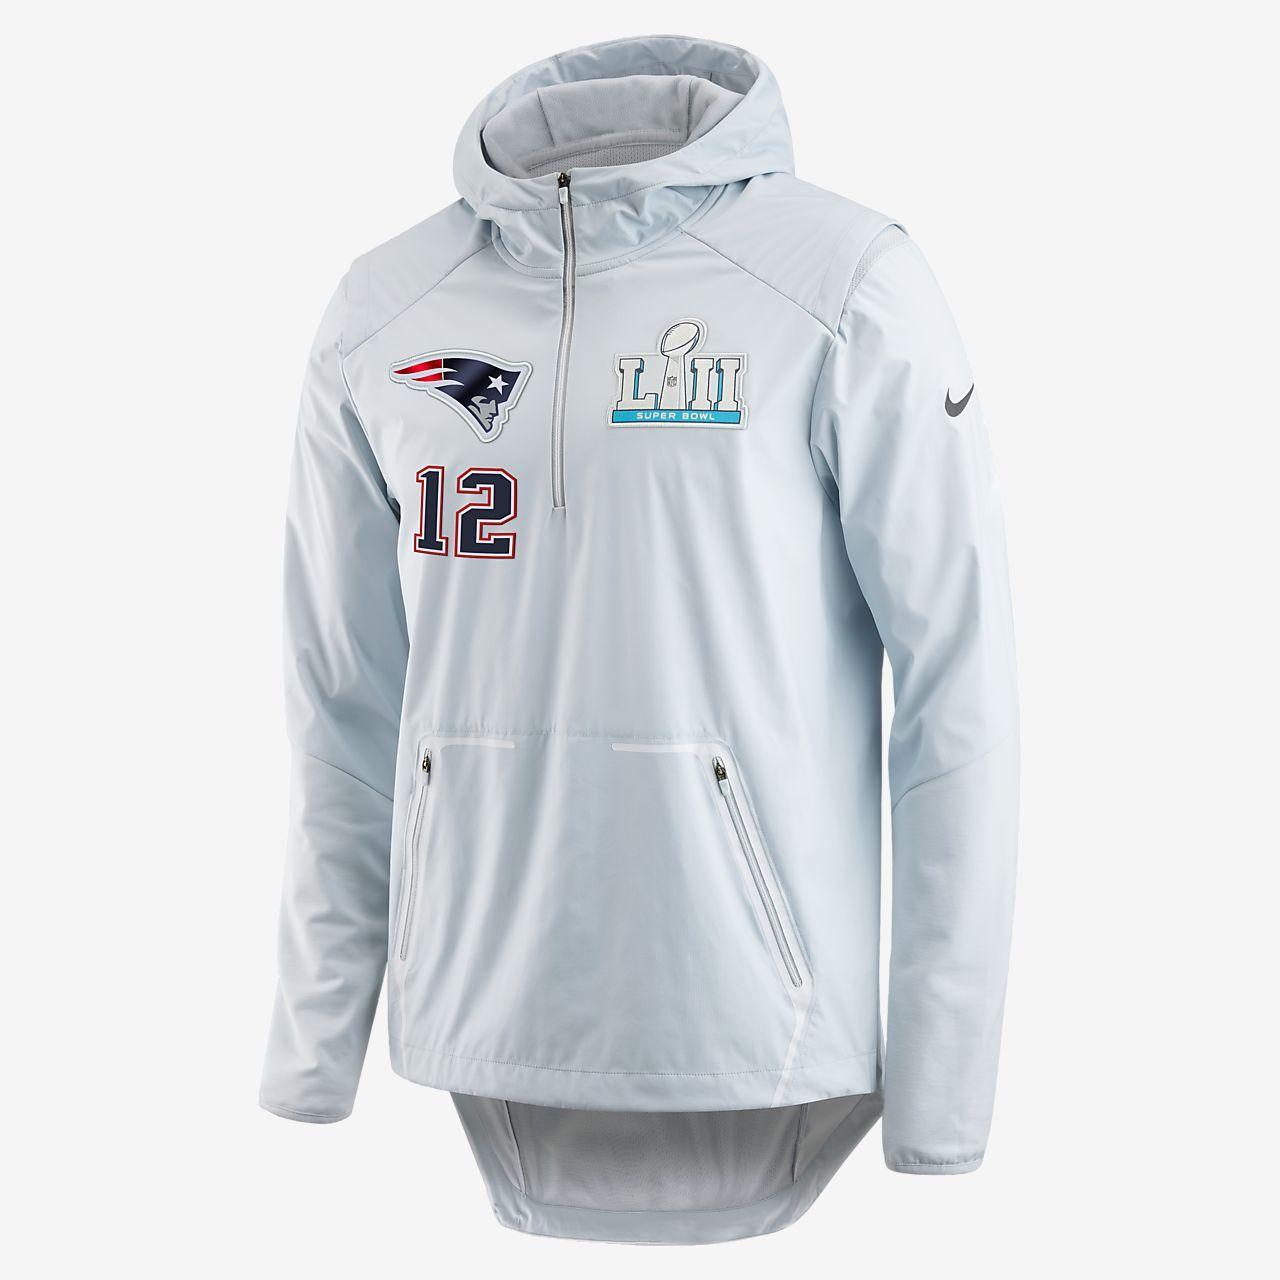 Sblii Nike Alpha Ros Nfl Patriots Men S Jacket Mens Nike Jacket Mens Jackets Quarter Zip Jacket